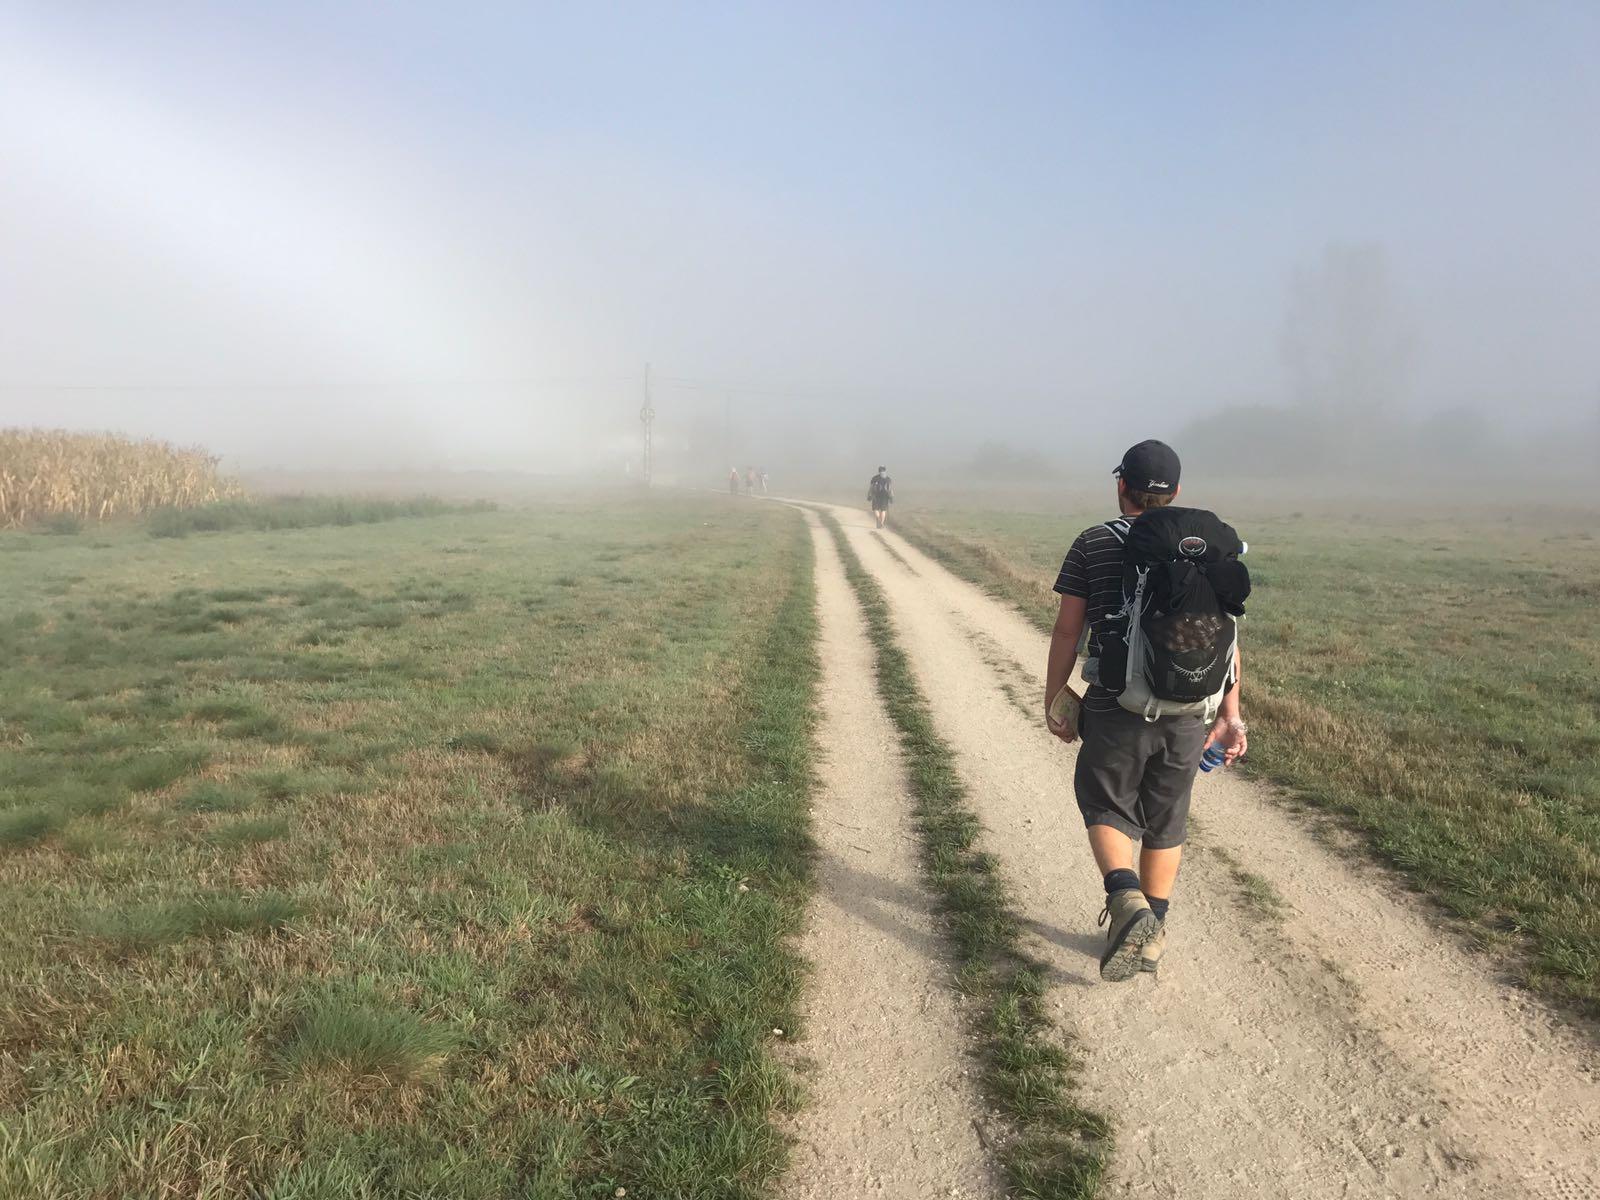 Tom walking through a misty field